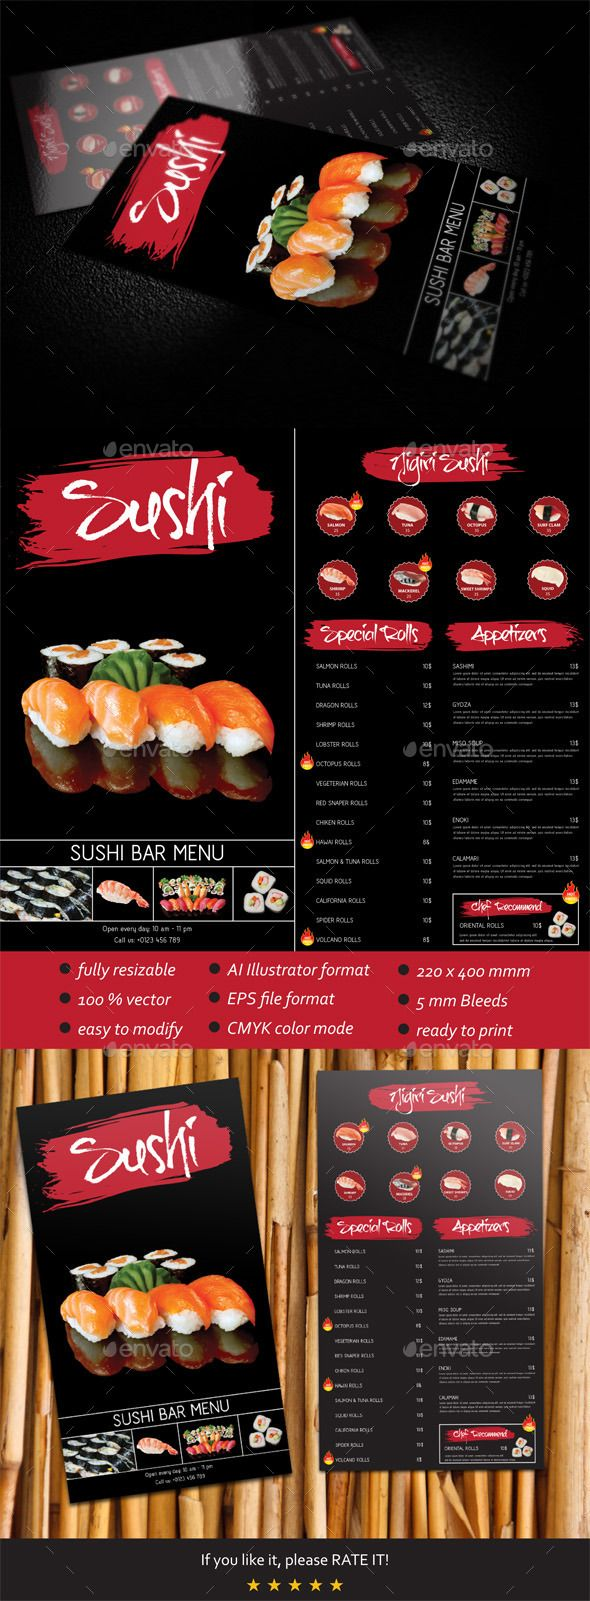 Sushi Bar Menu template | Pinterest | Sushi bar menu, Menu templates ...